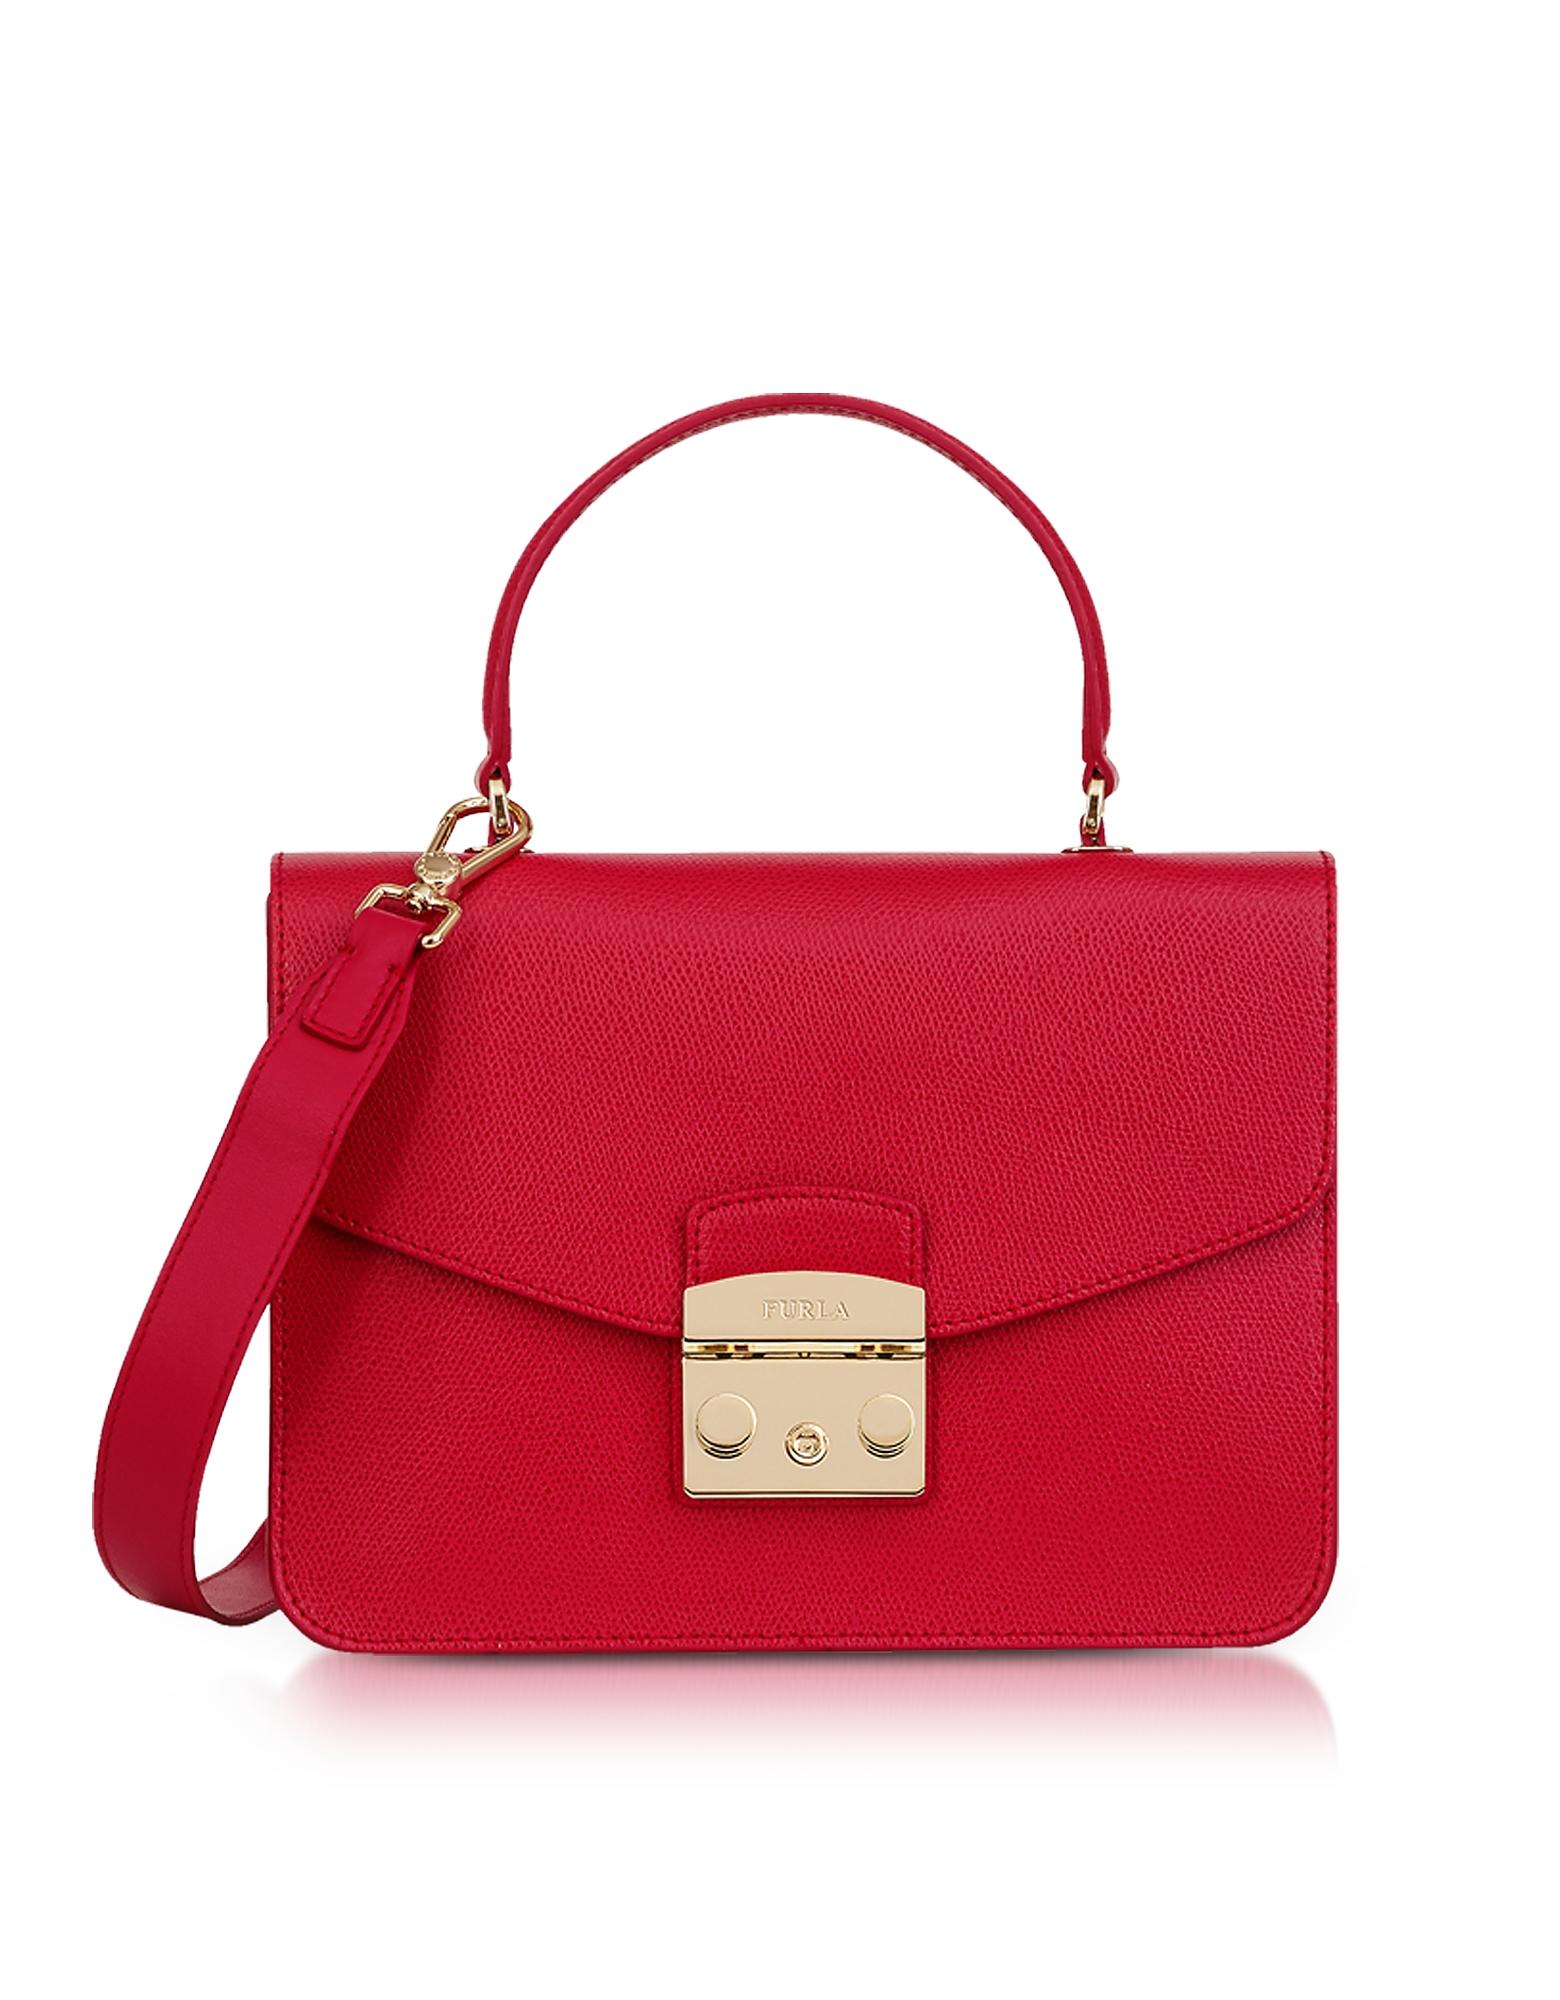 Image of Furla Designer Handbags, Ruby Red Lizard Printed Leather Metropolis Small Top-Handle Shoulder Bag